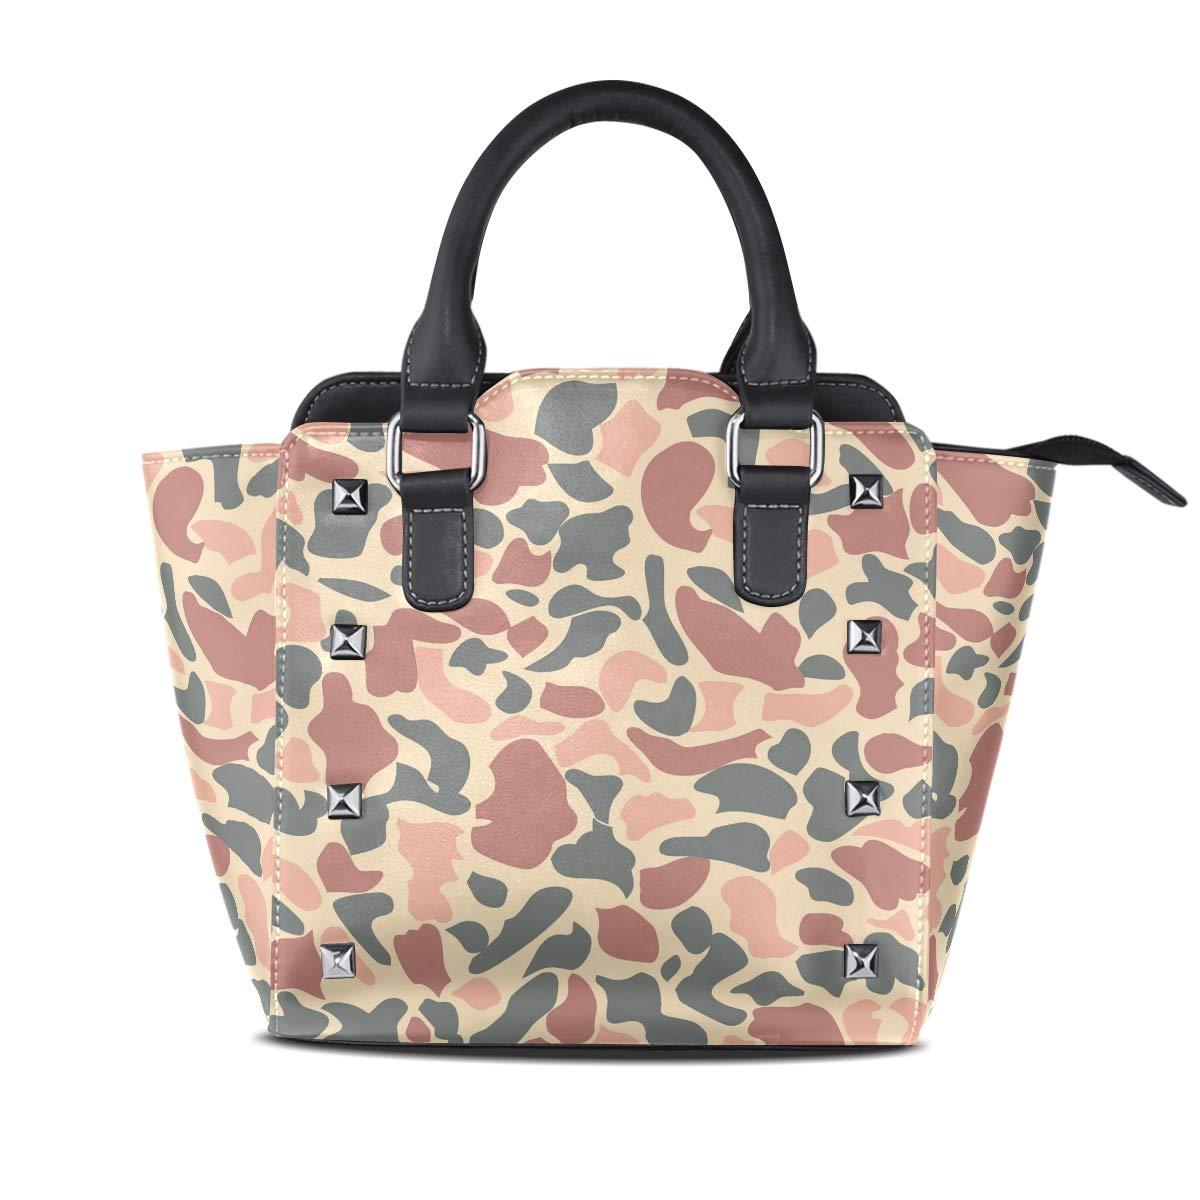 Design2 Handbag Beautiful Village Genuine Leather Tote Rivet Bag Shoulder Strap Top Handle Women